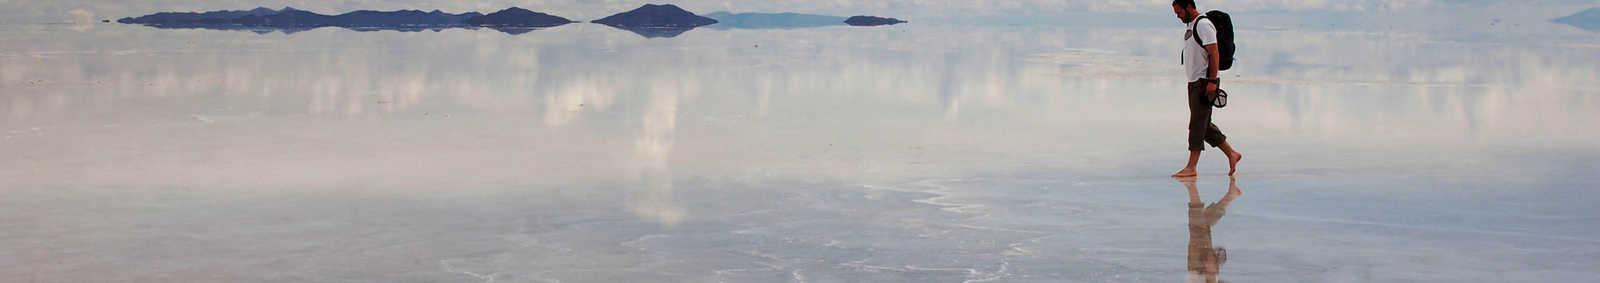 Walking over the reflective surface of the Uyuni Salt Flats, Bolivia